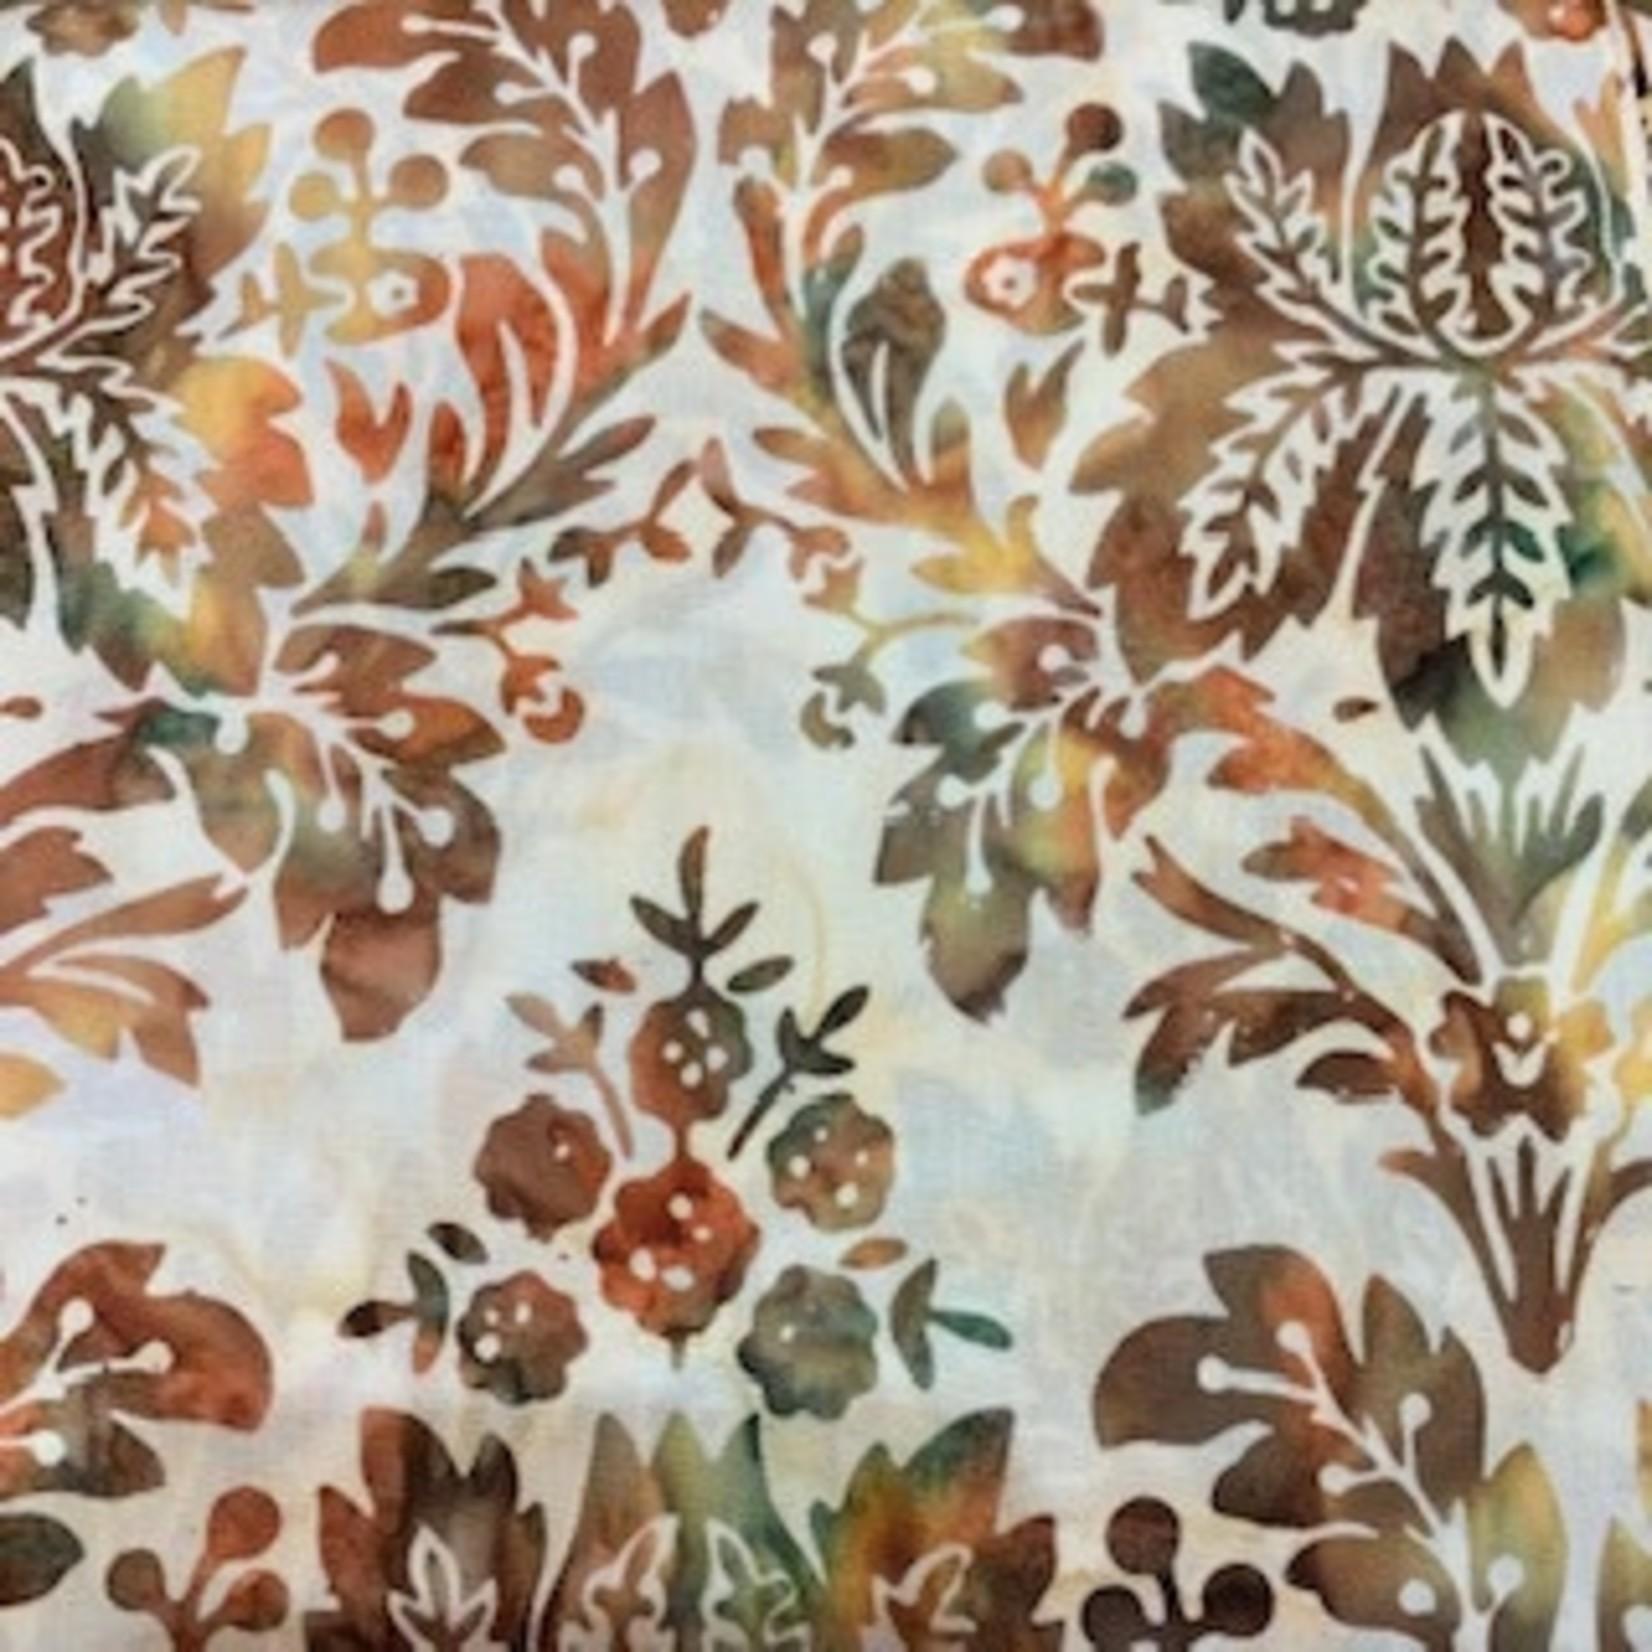 Hoffman Fabrics Bali Batik French Bouquet - Global Spice